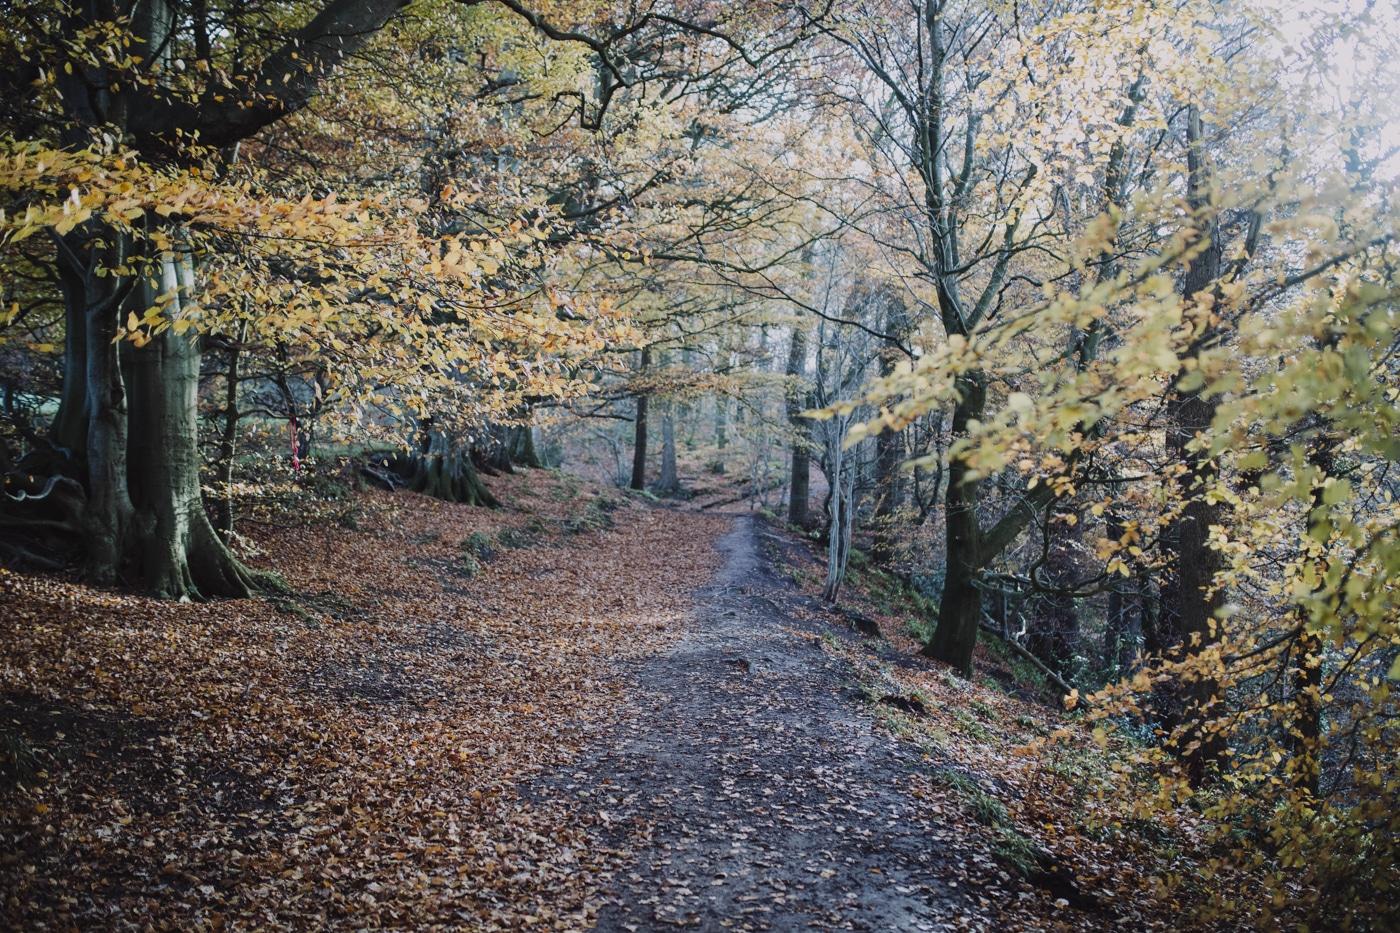 Path through autumn wooded area by Joshua Wyborn Photographic